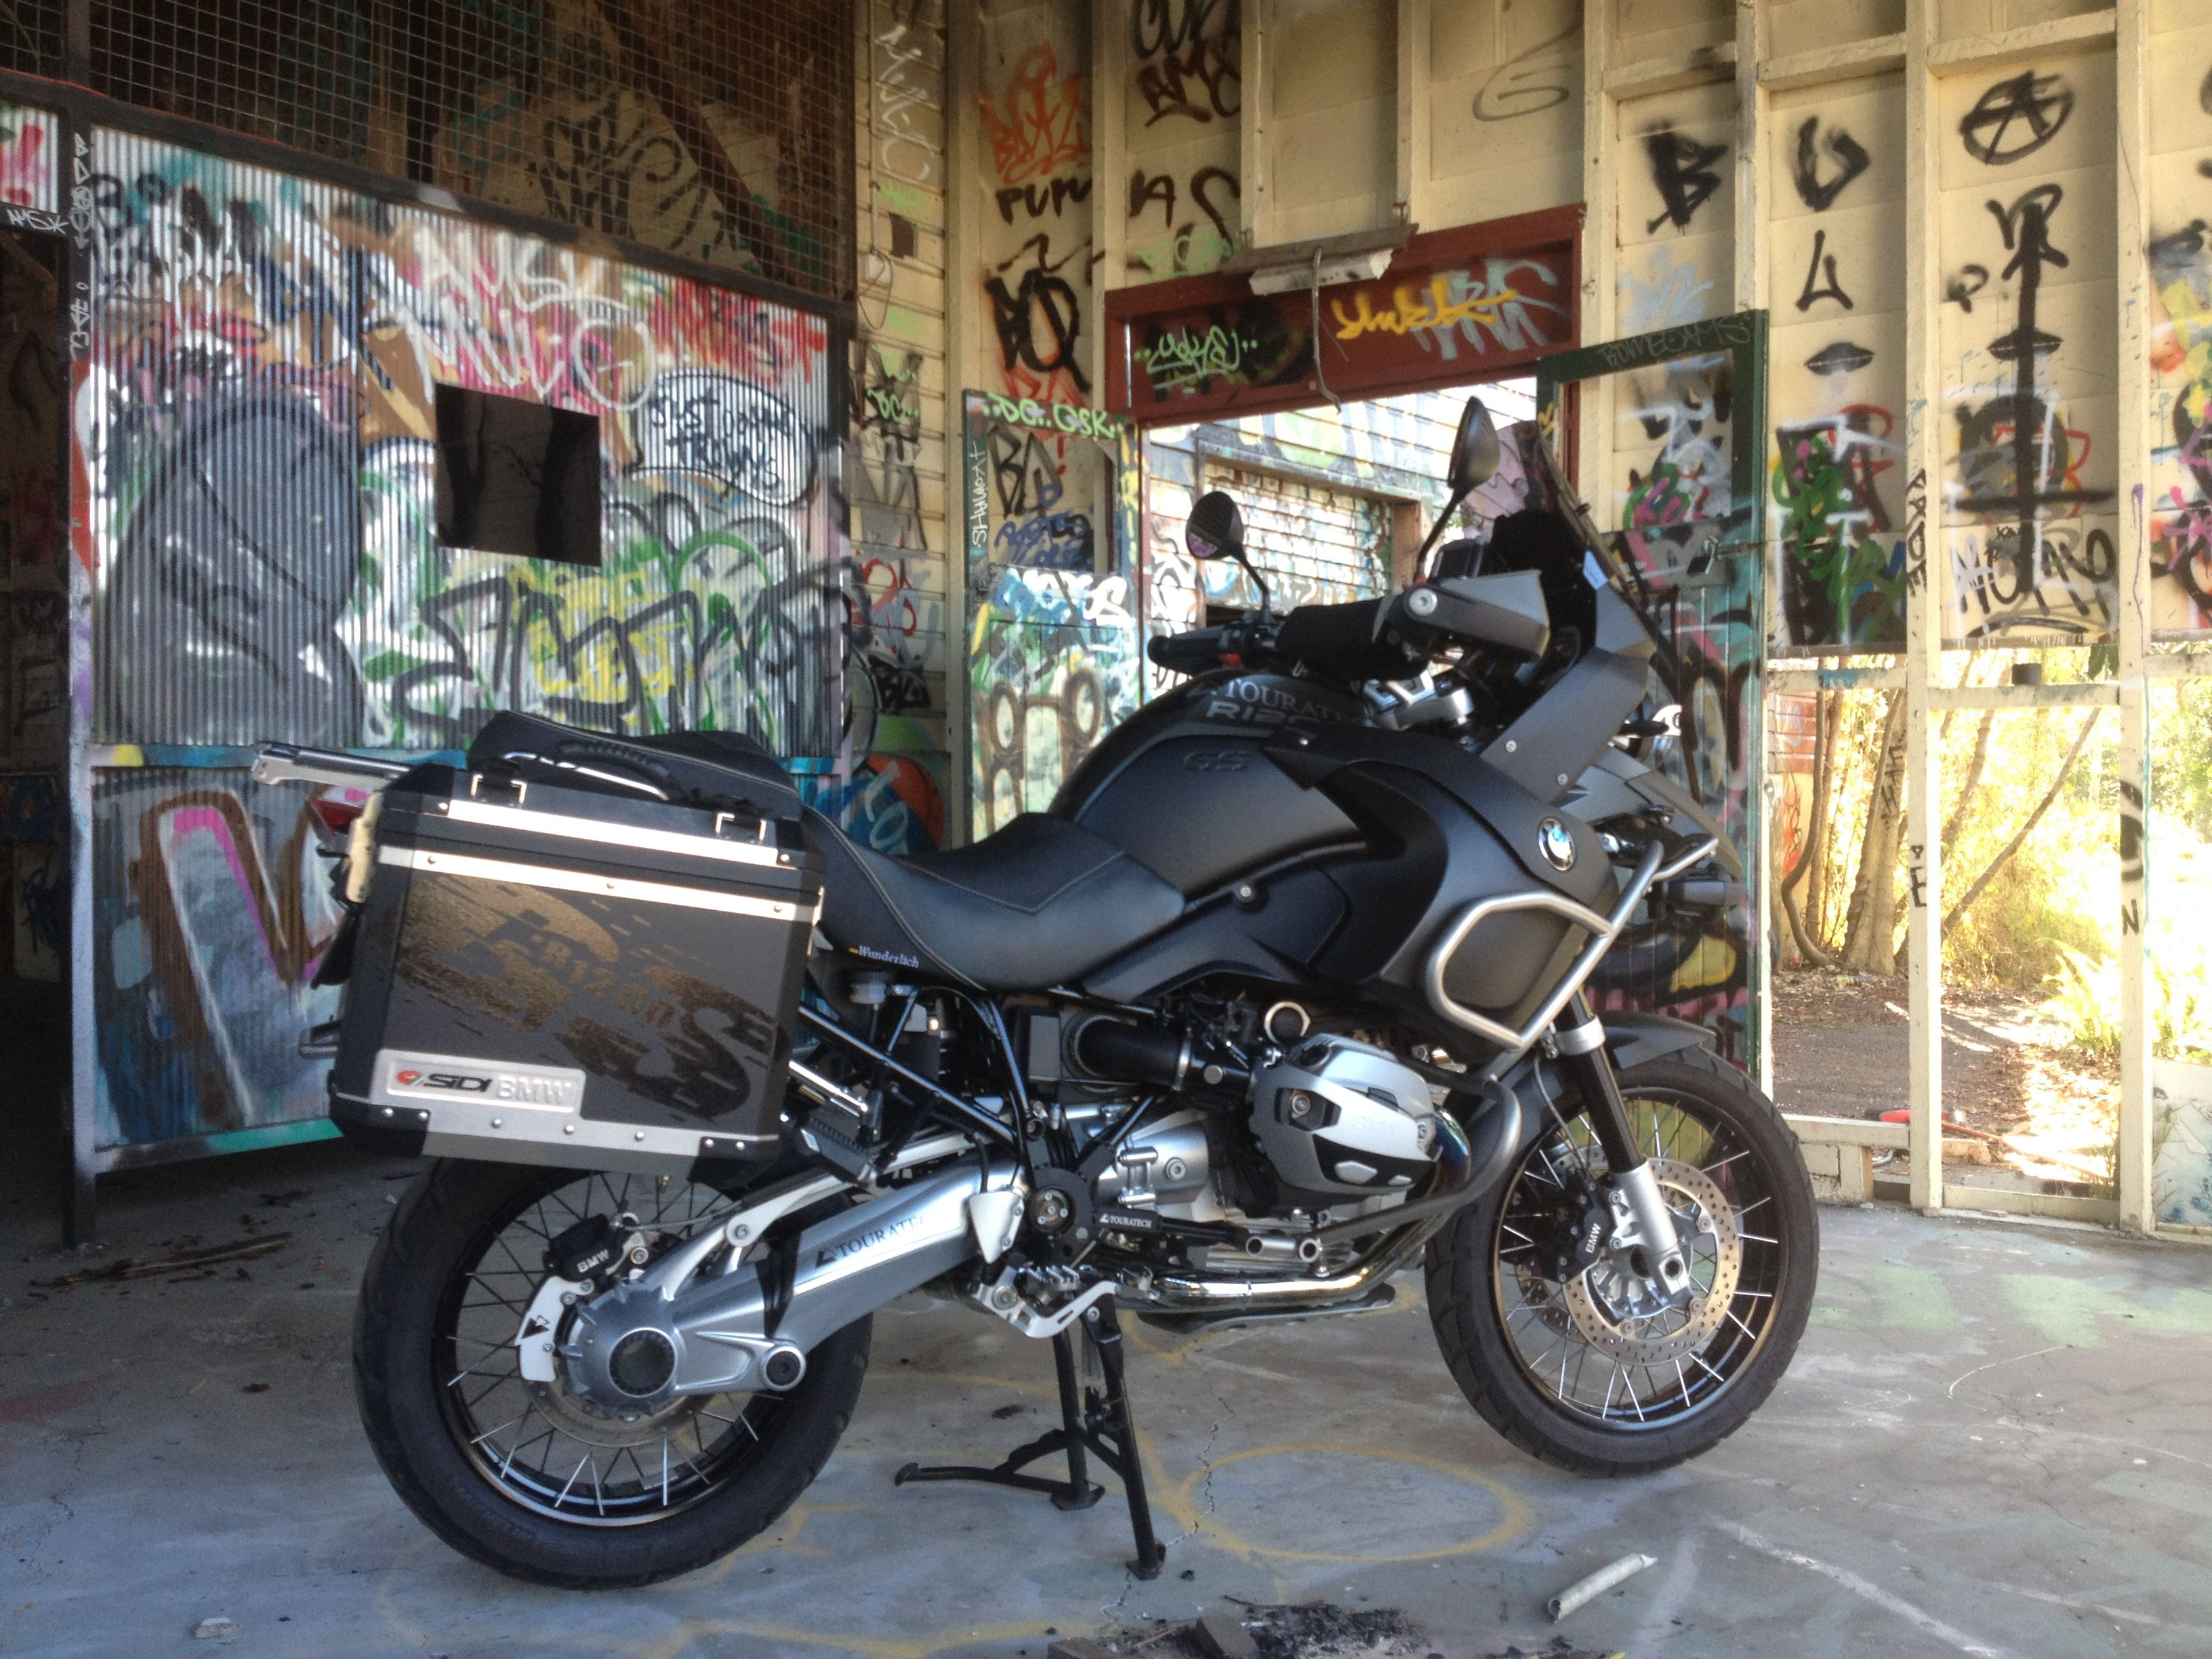 Vinyl wrap for you're motorcycle | Bike Fun